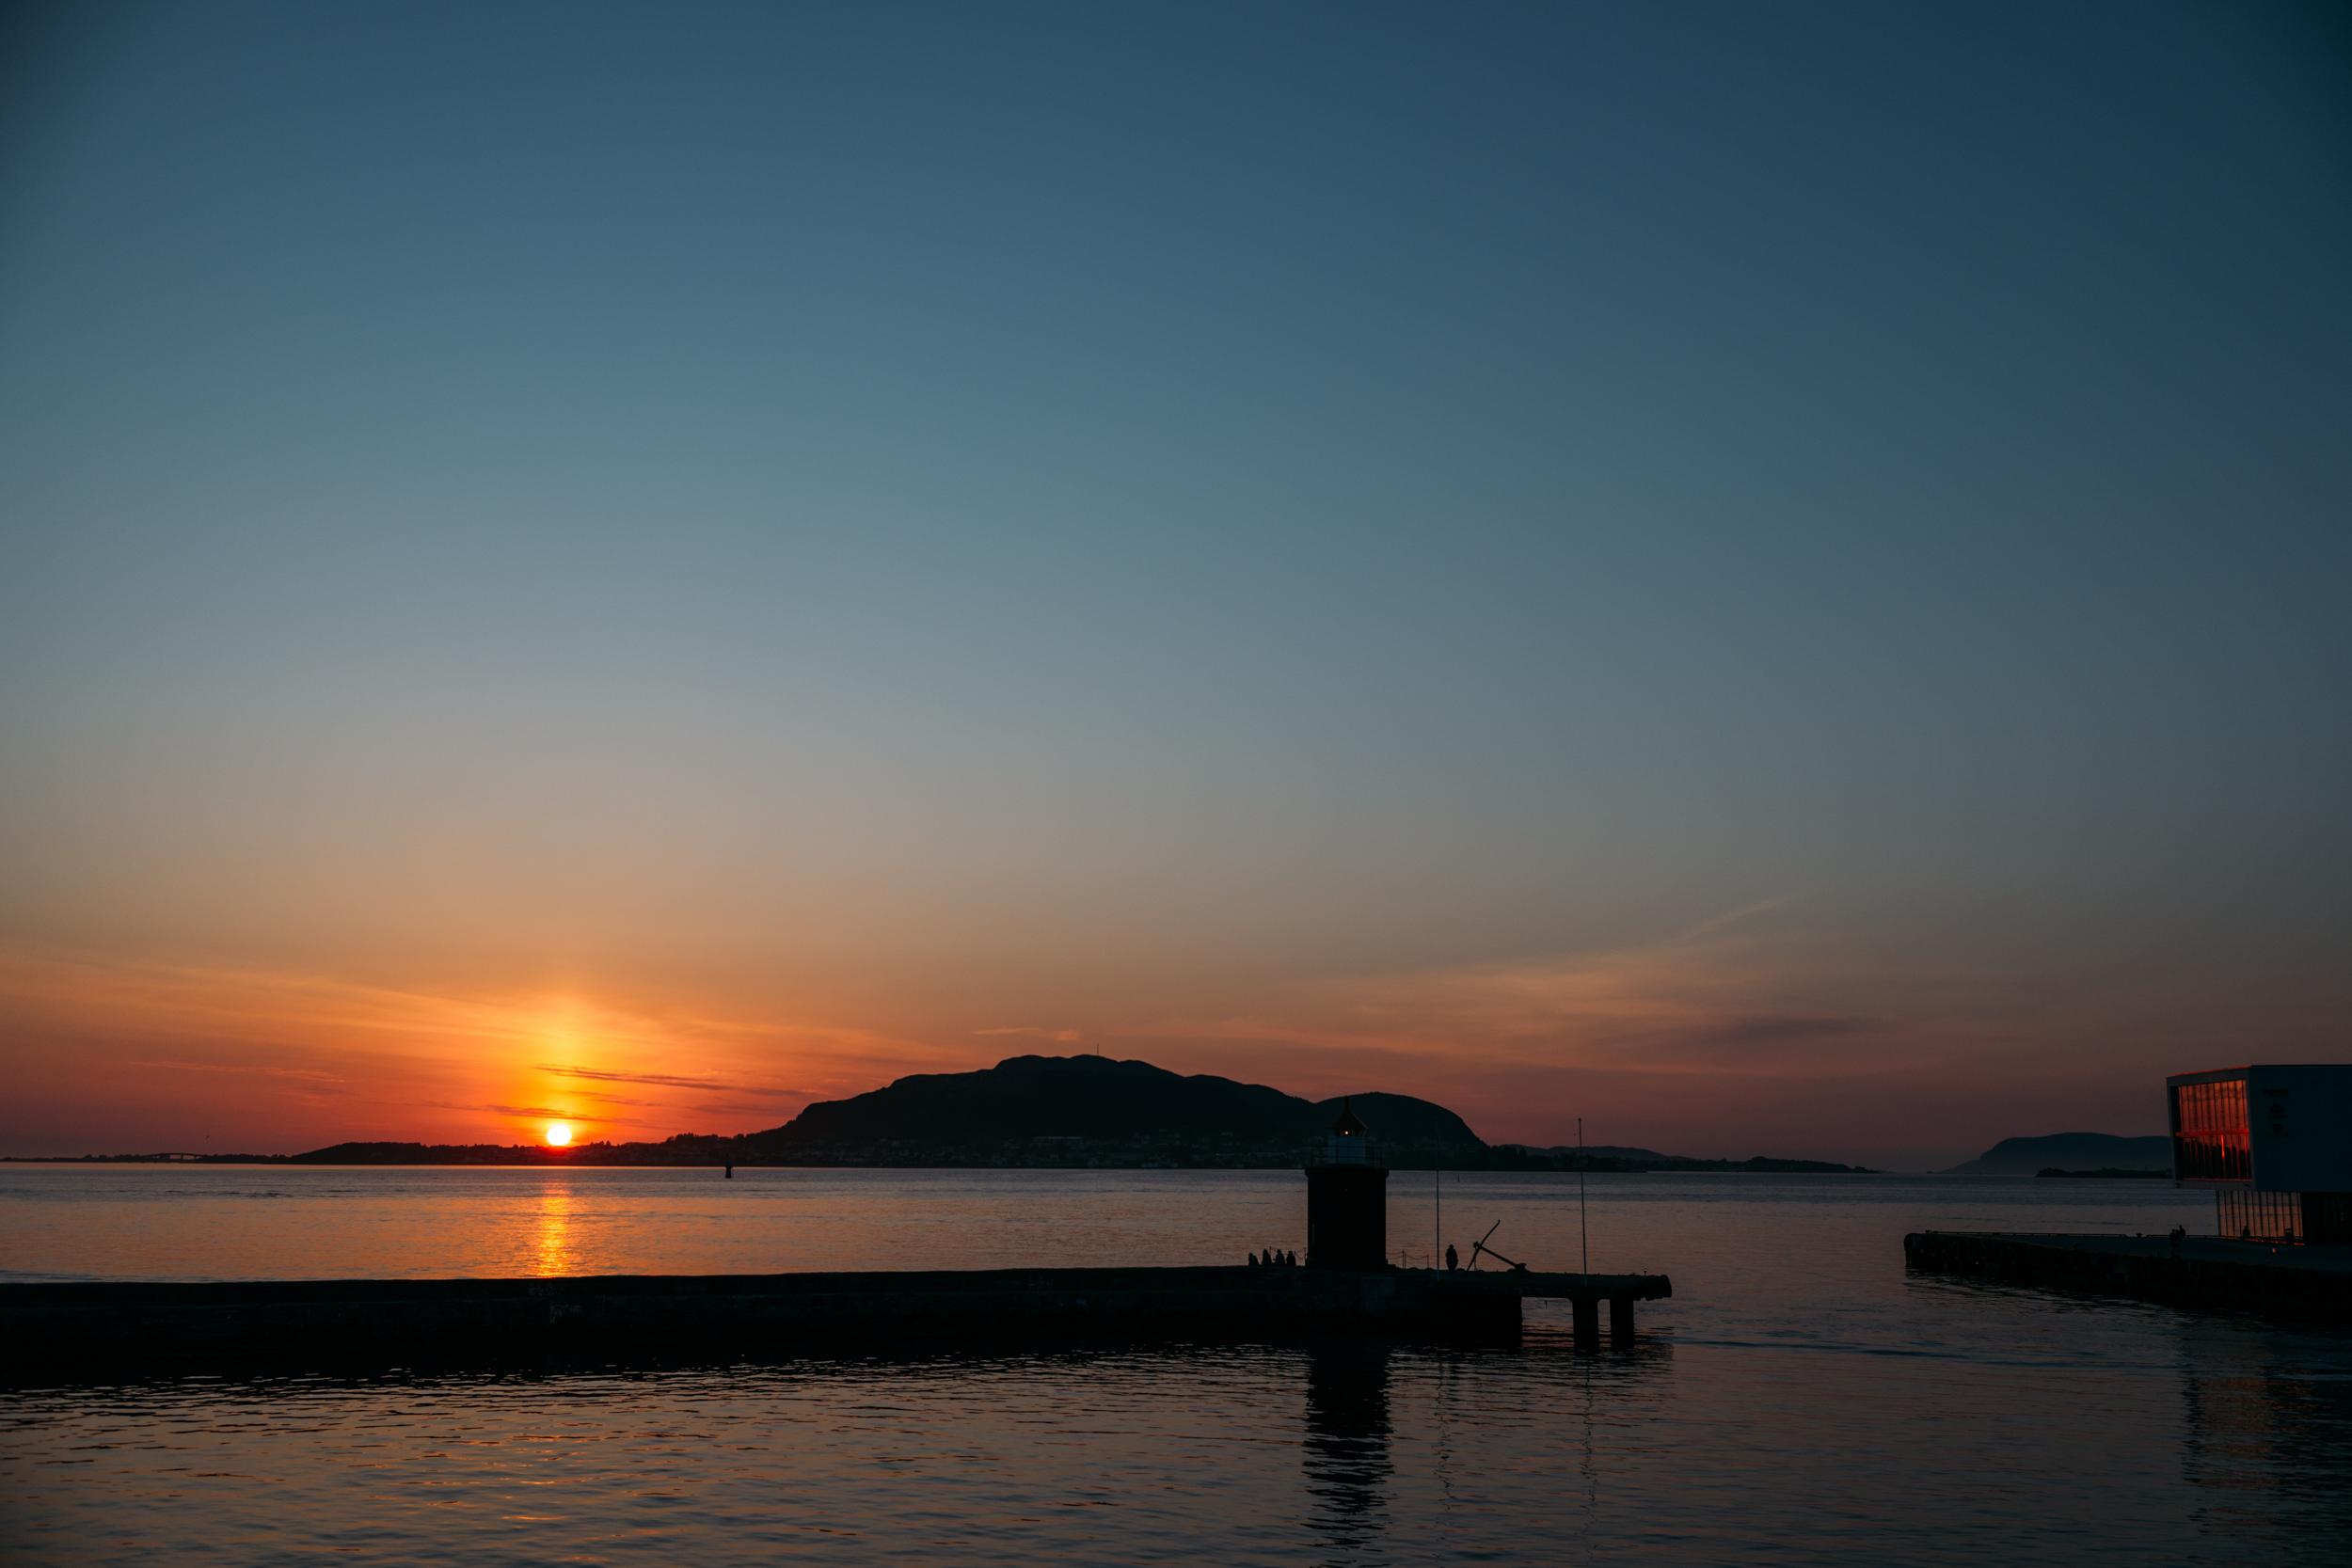 One last sunset view of Ålesund.